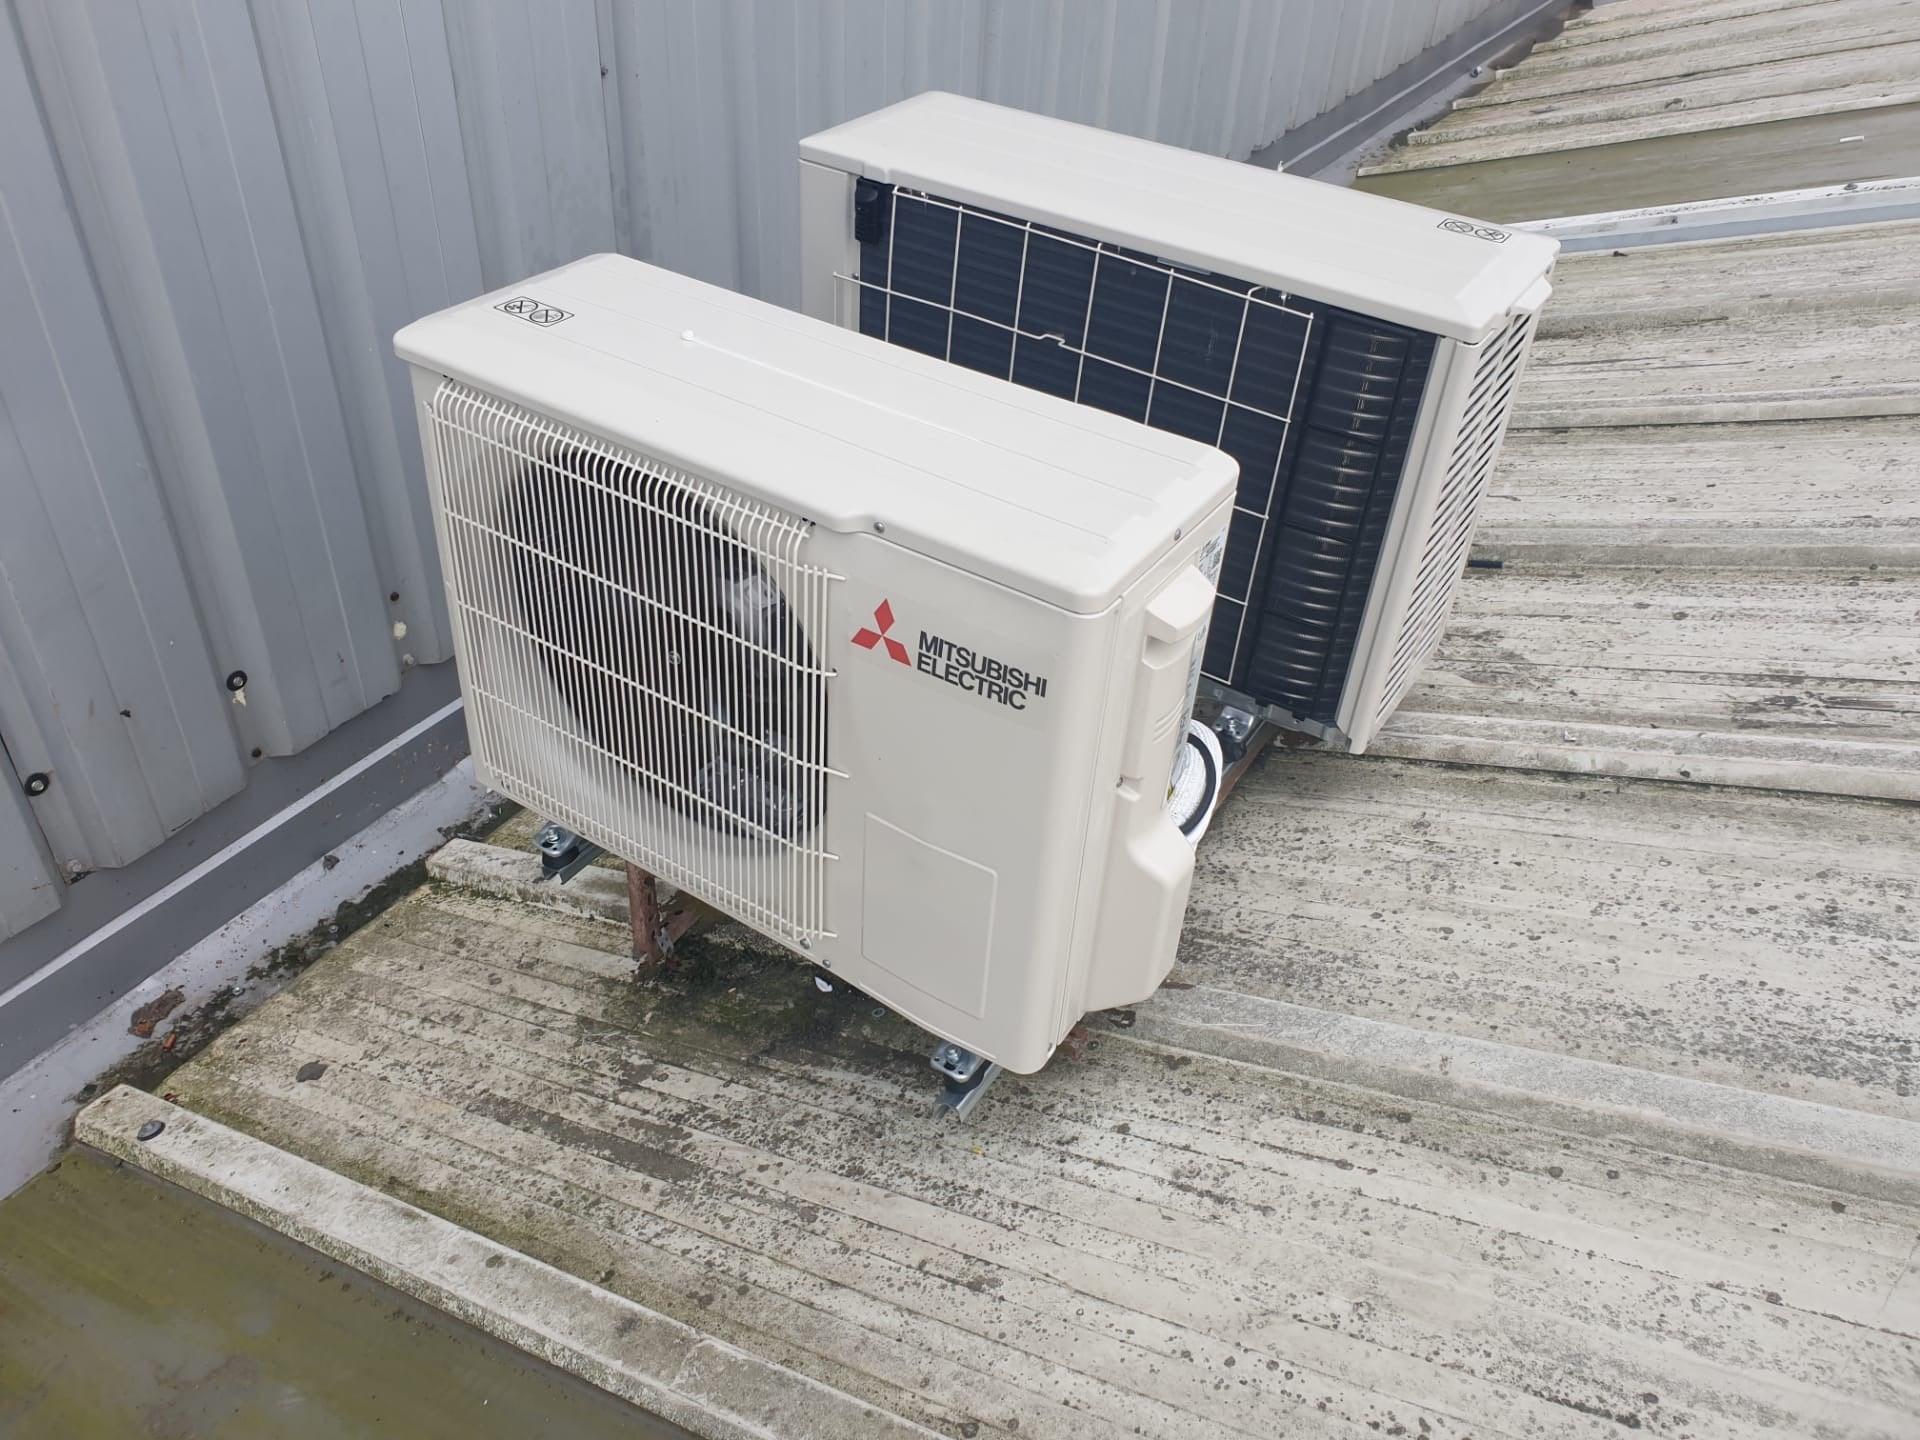 Mitsubishi Electric outdoor units